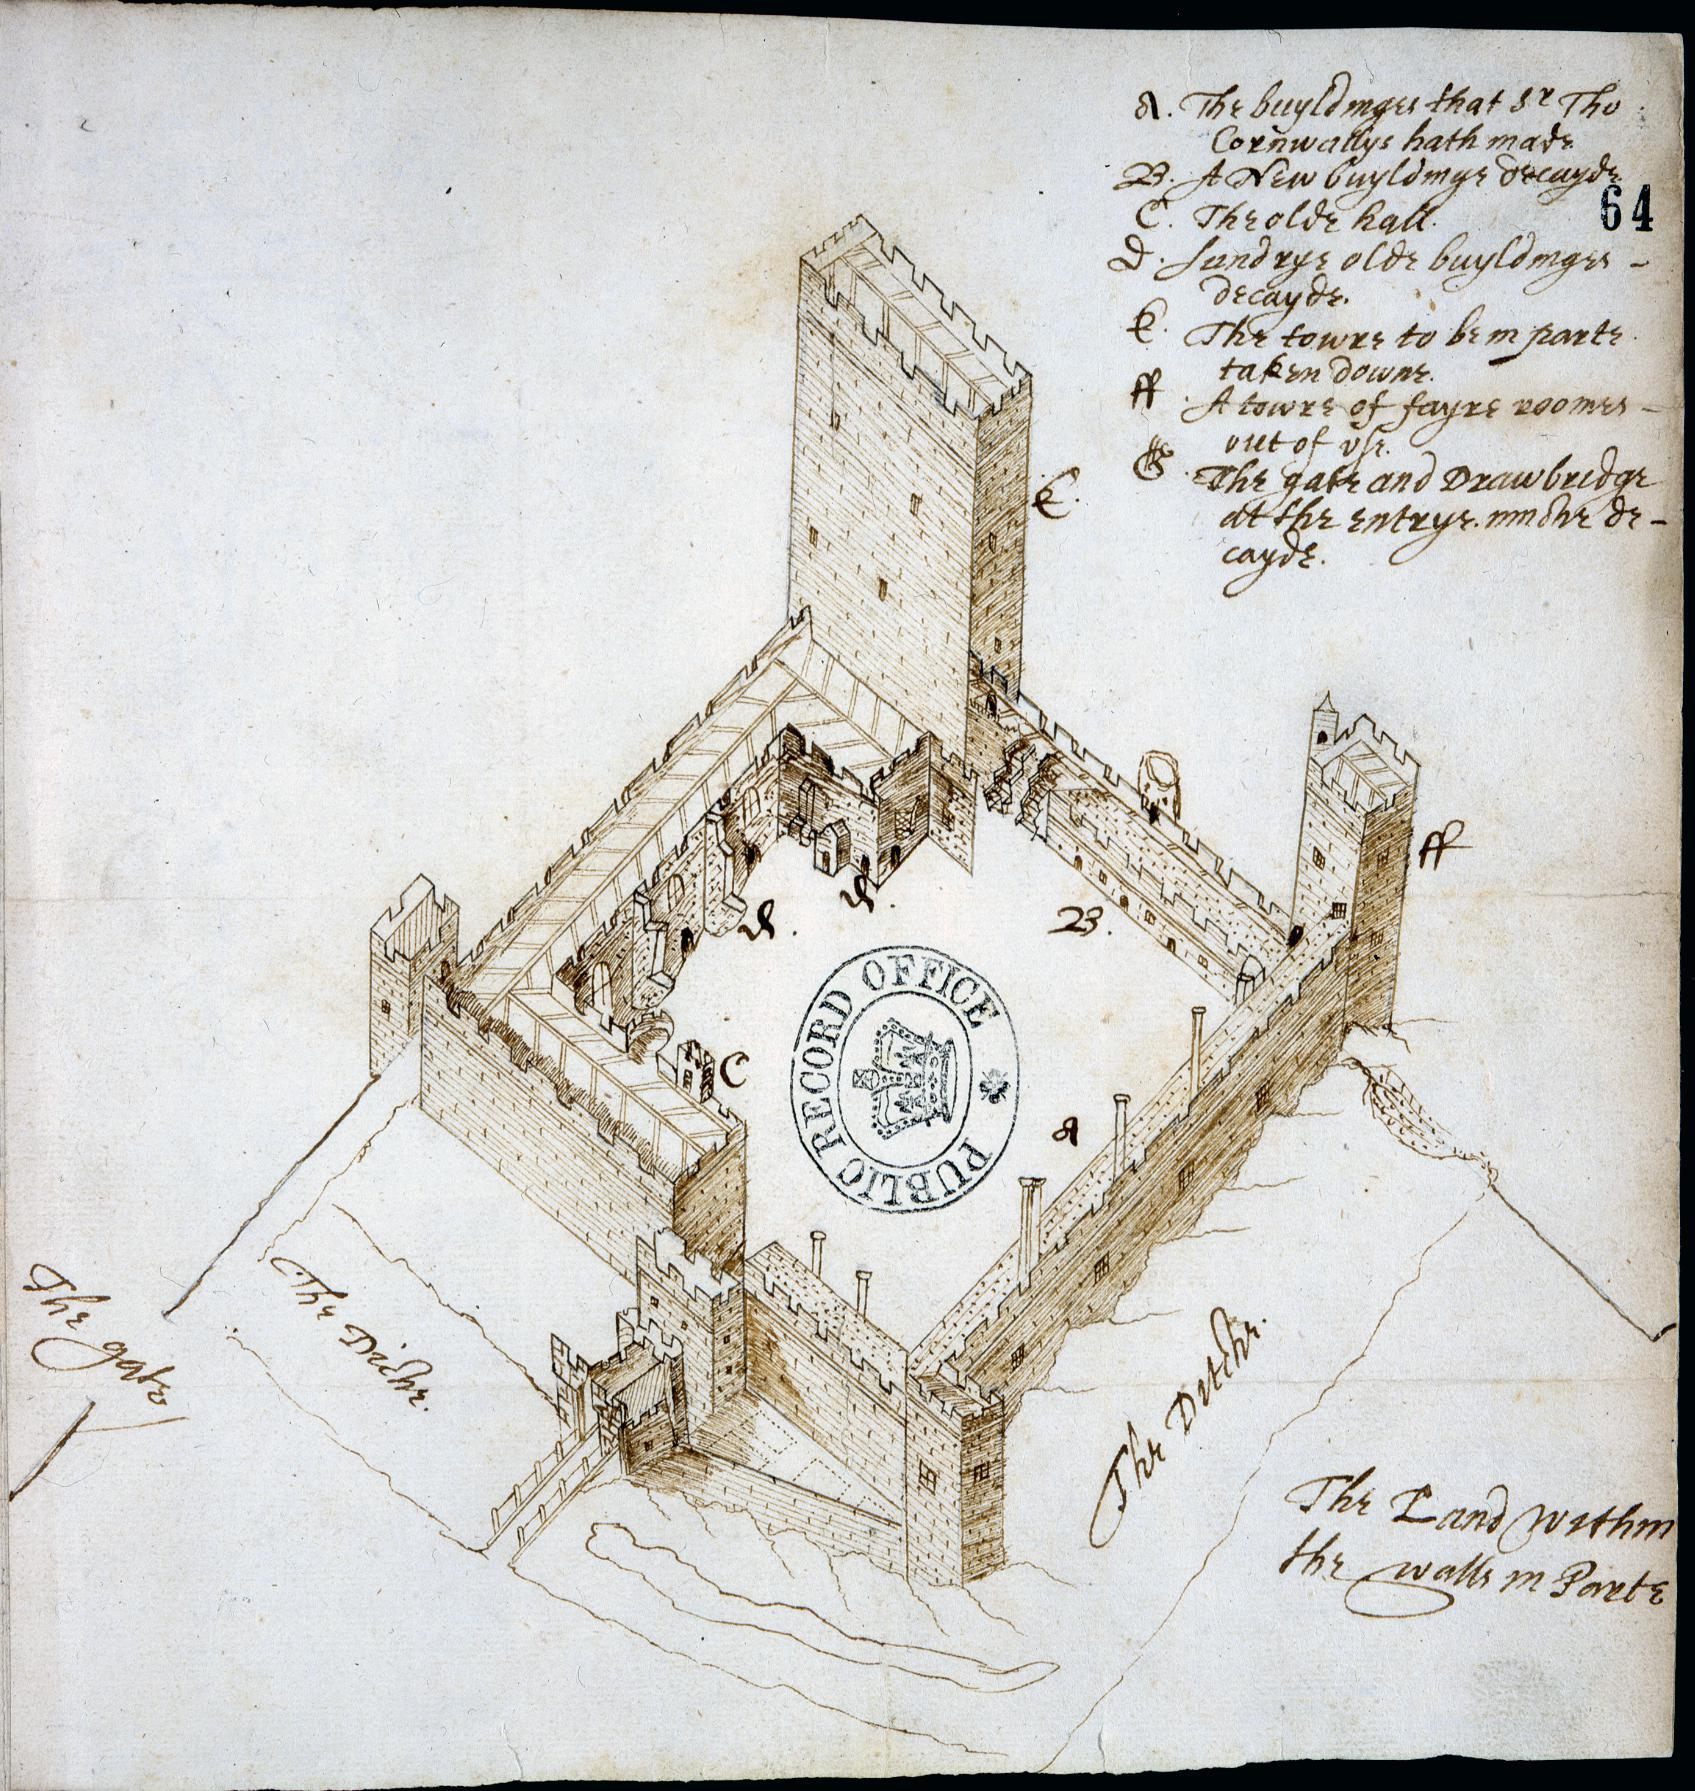 SP14/48 (46) Bird's eye view of Portchester Castle, by John Norden, 1609